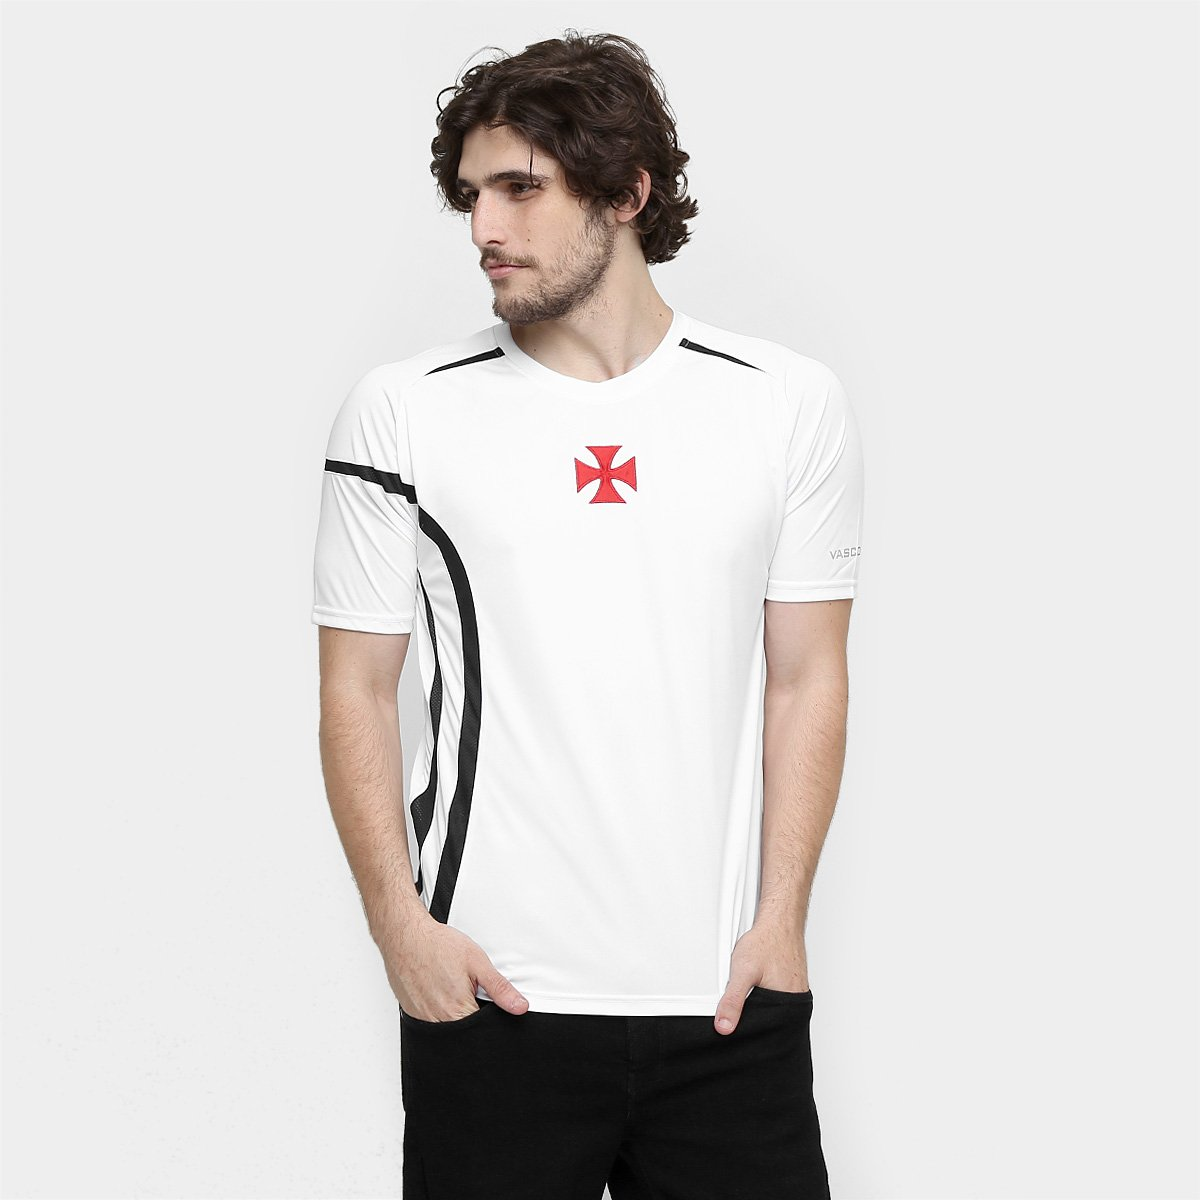 b98dcbfaa7b62 Camiseta Vasco Cruz de Malta - Compre Agora